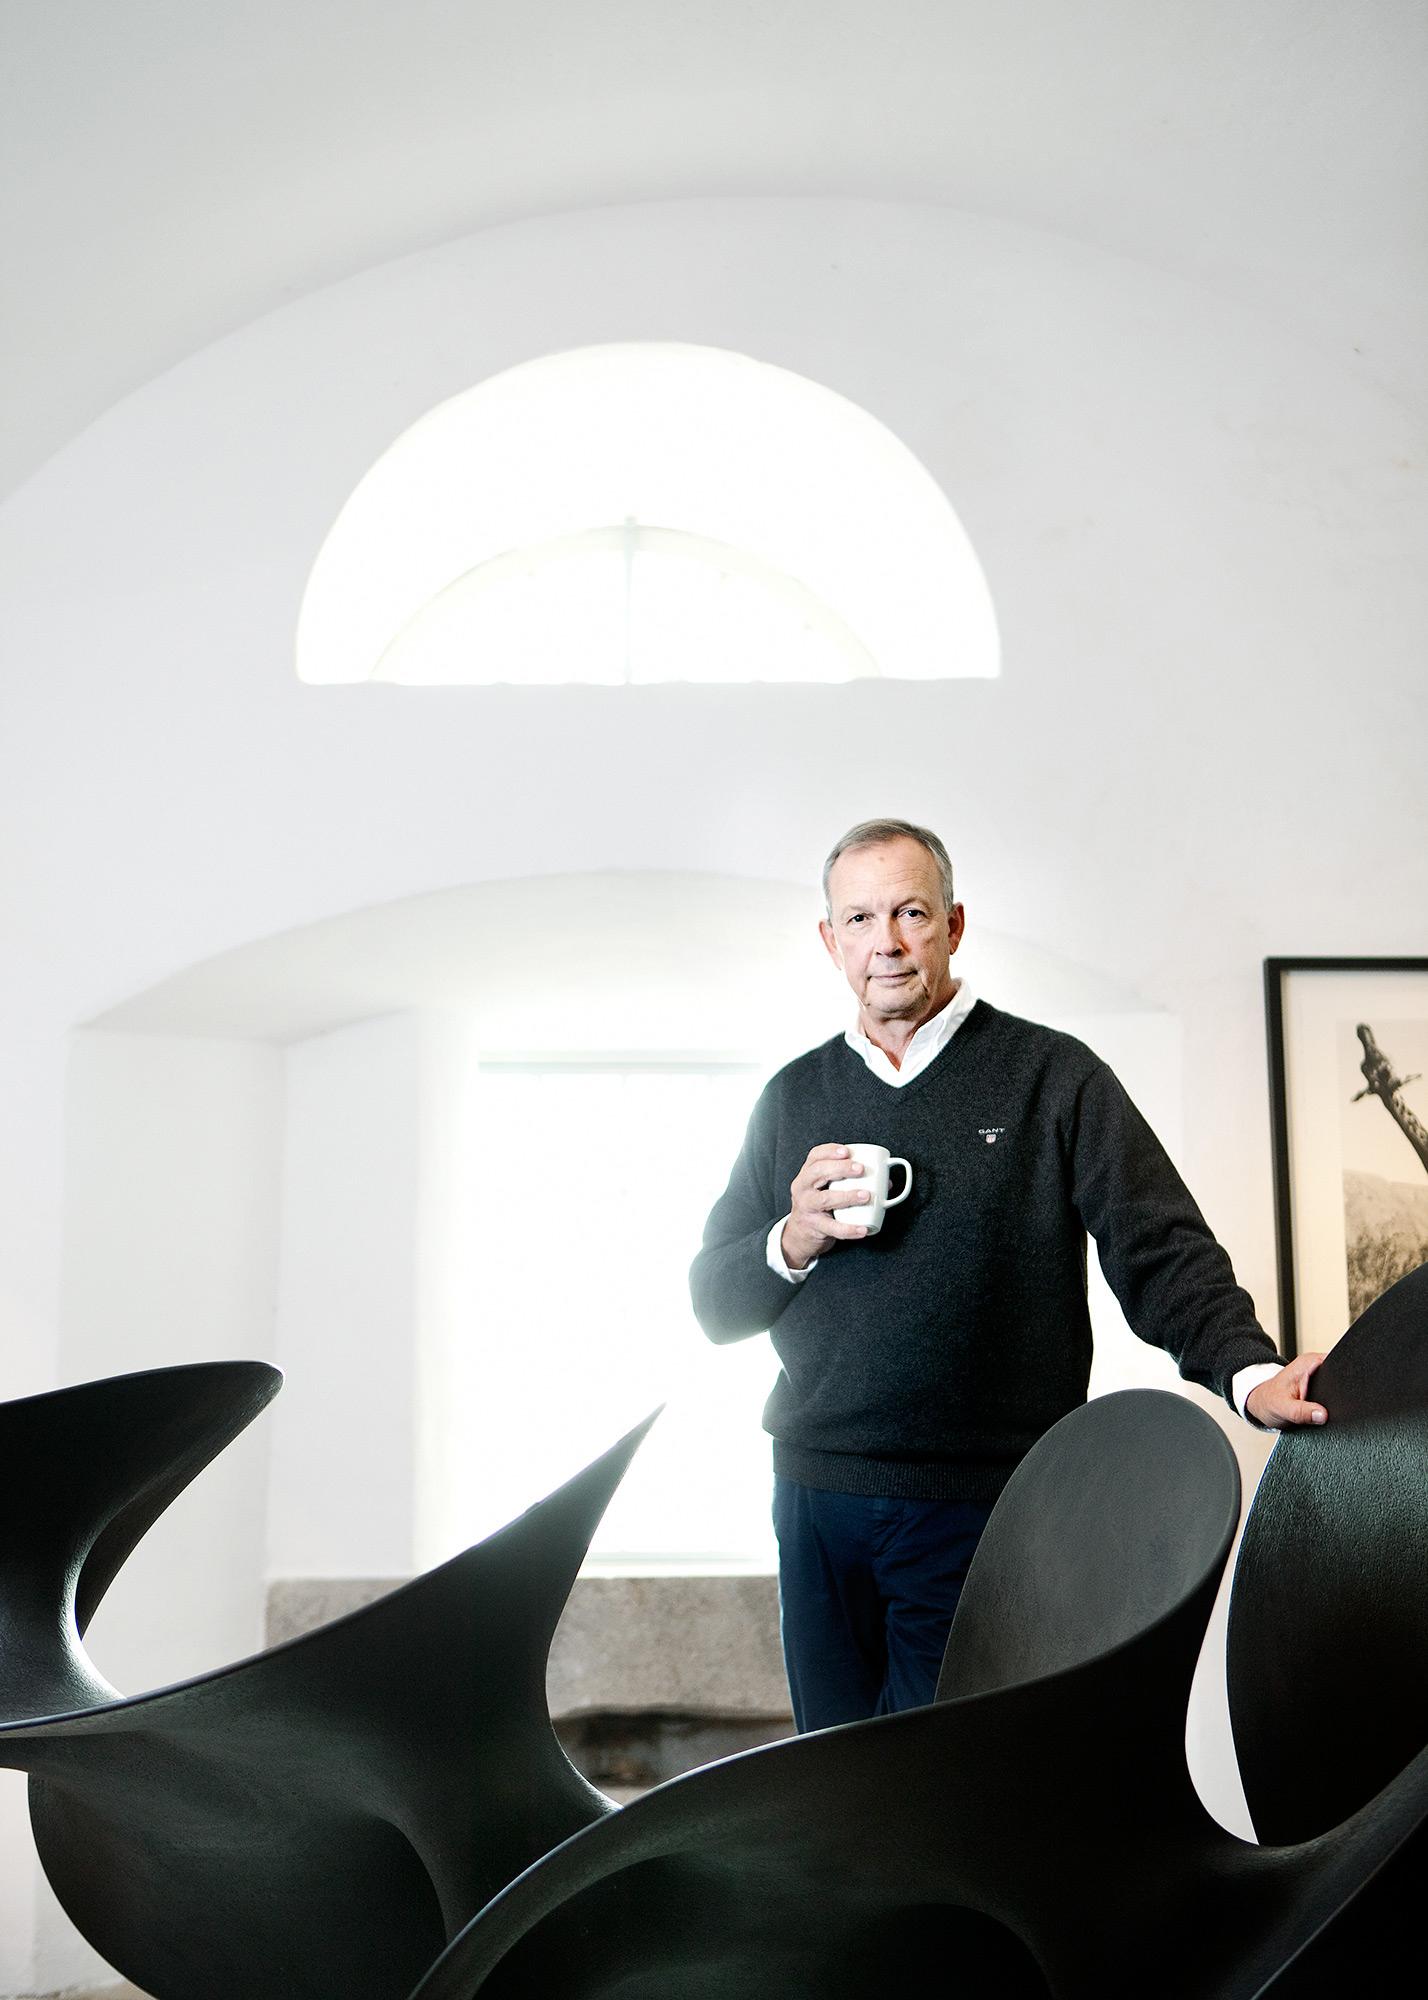 Peter Hjörne